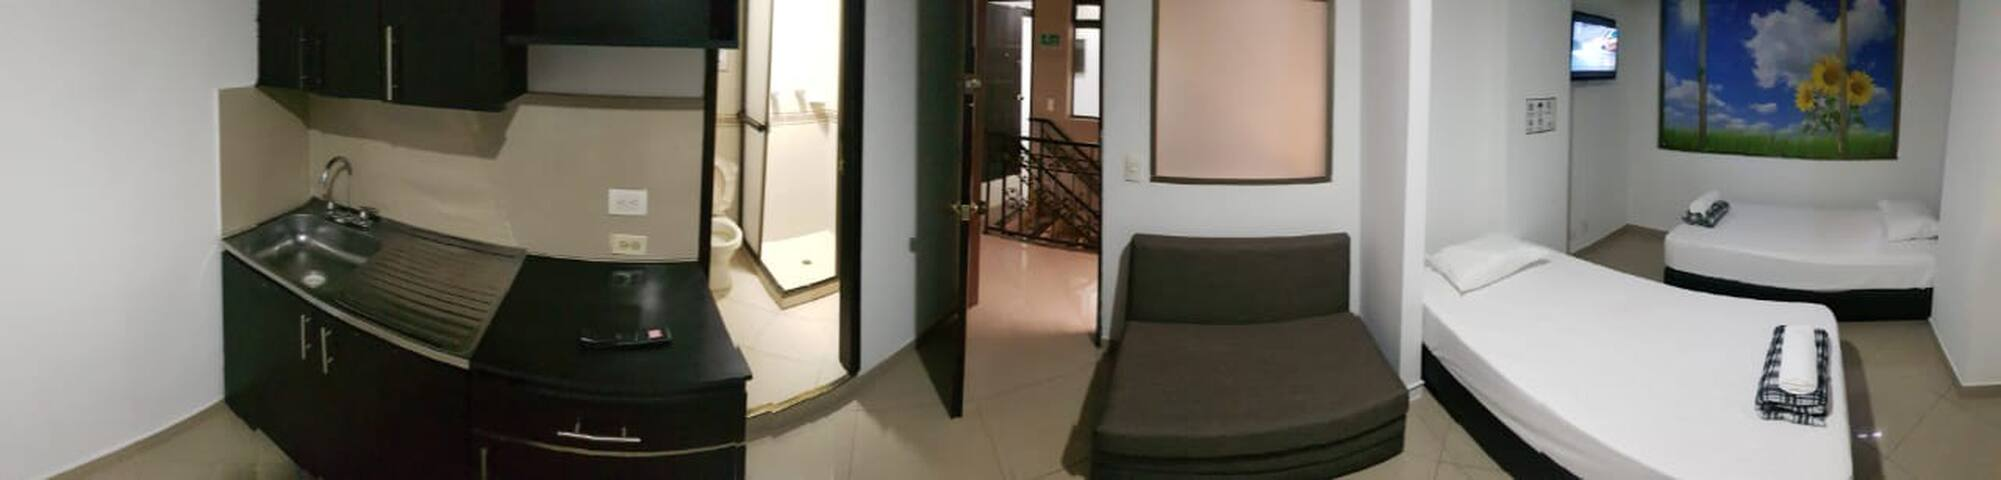 Apartamento amoblado Laureles 503 frente Unicentro